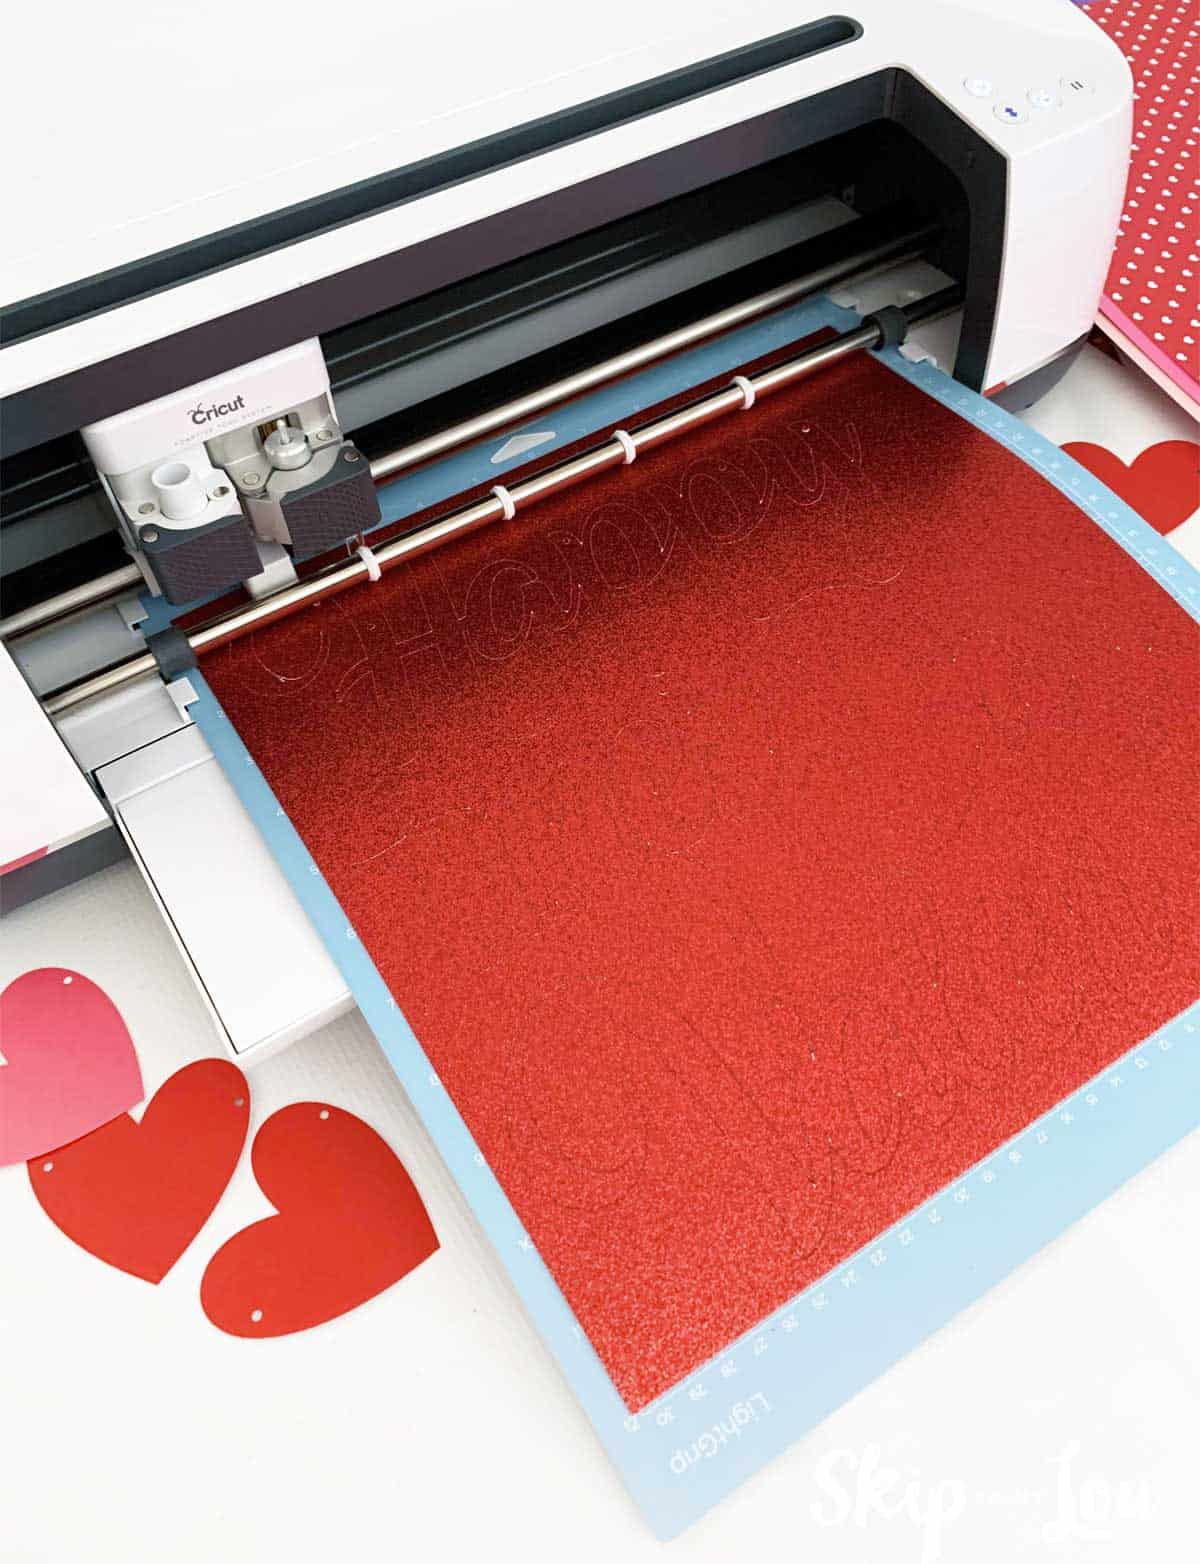 red glitter cardstock loaded in Cricut Maker